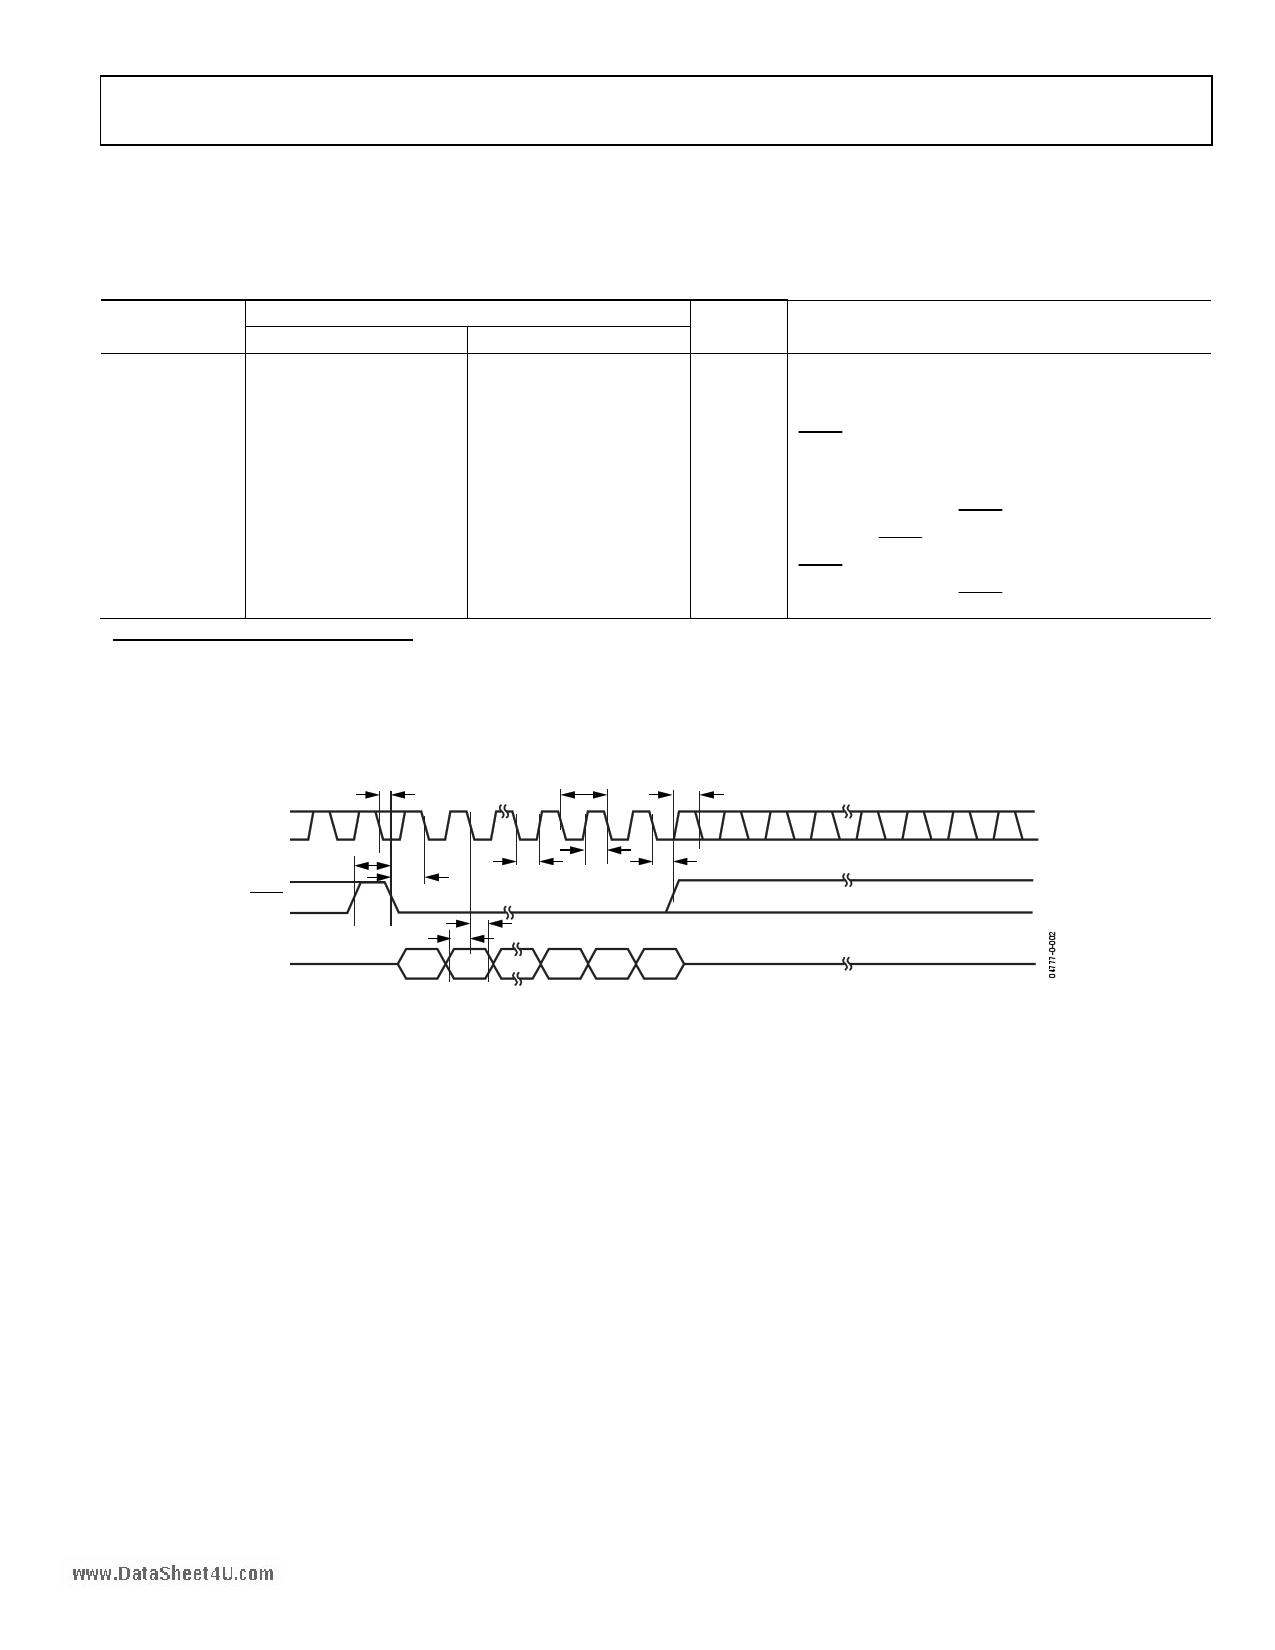 AD5662 pdf, arduino